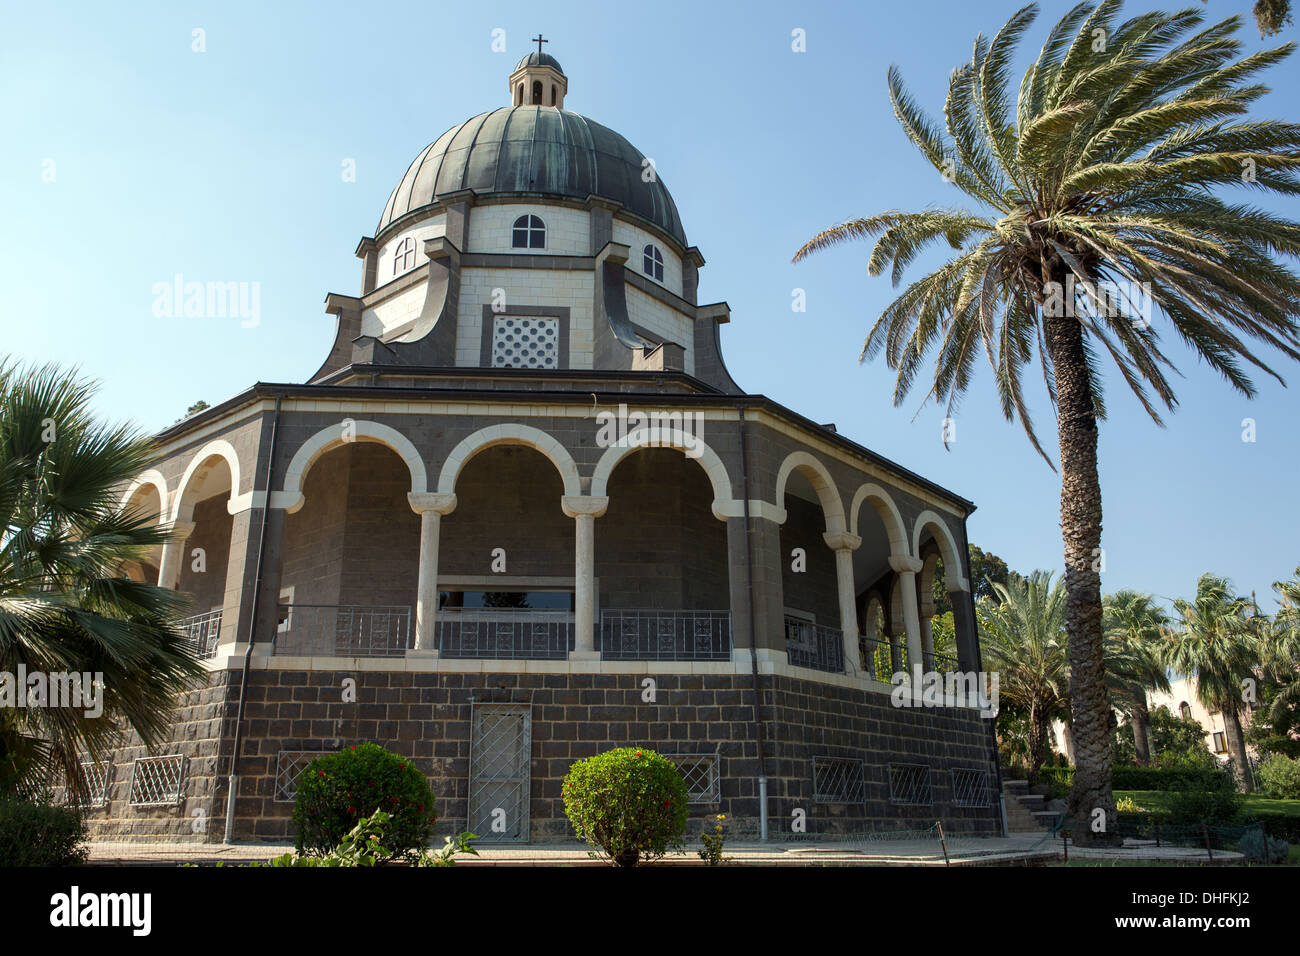 Chapel on the Mount of Beatitudes, Israel Stock Photo